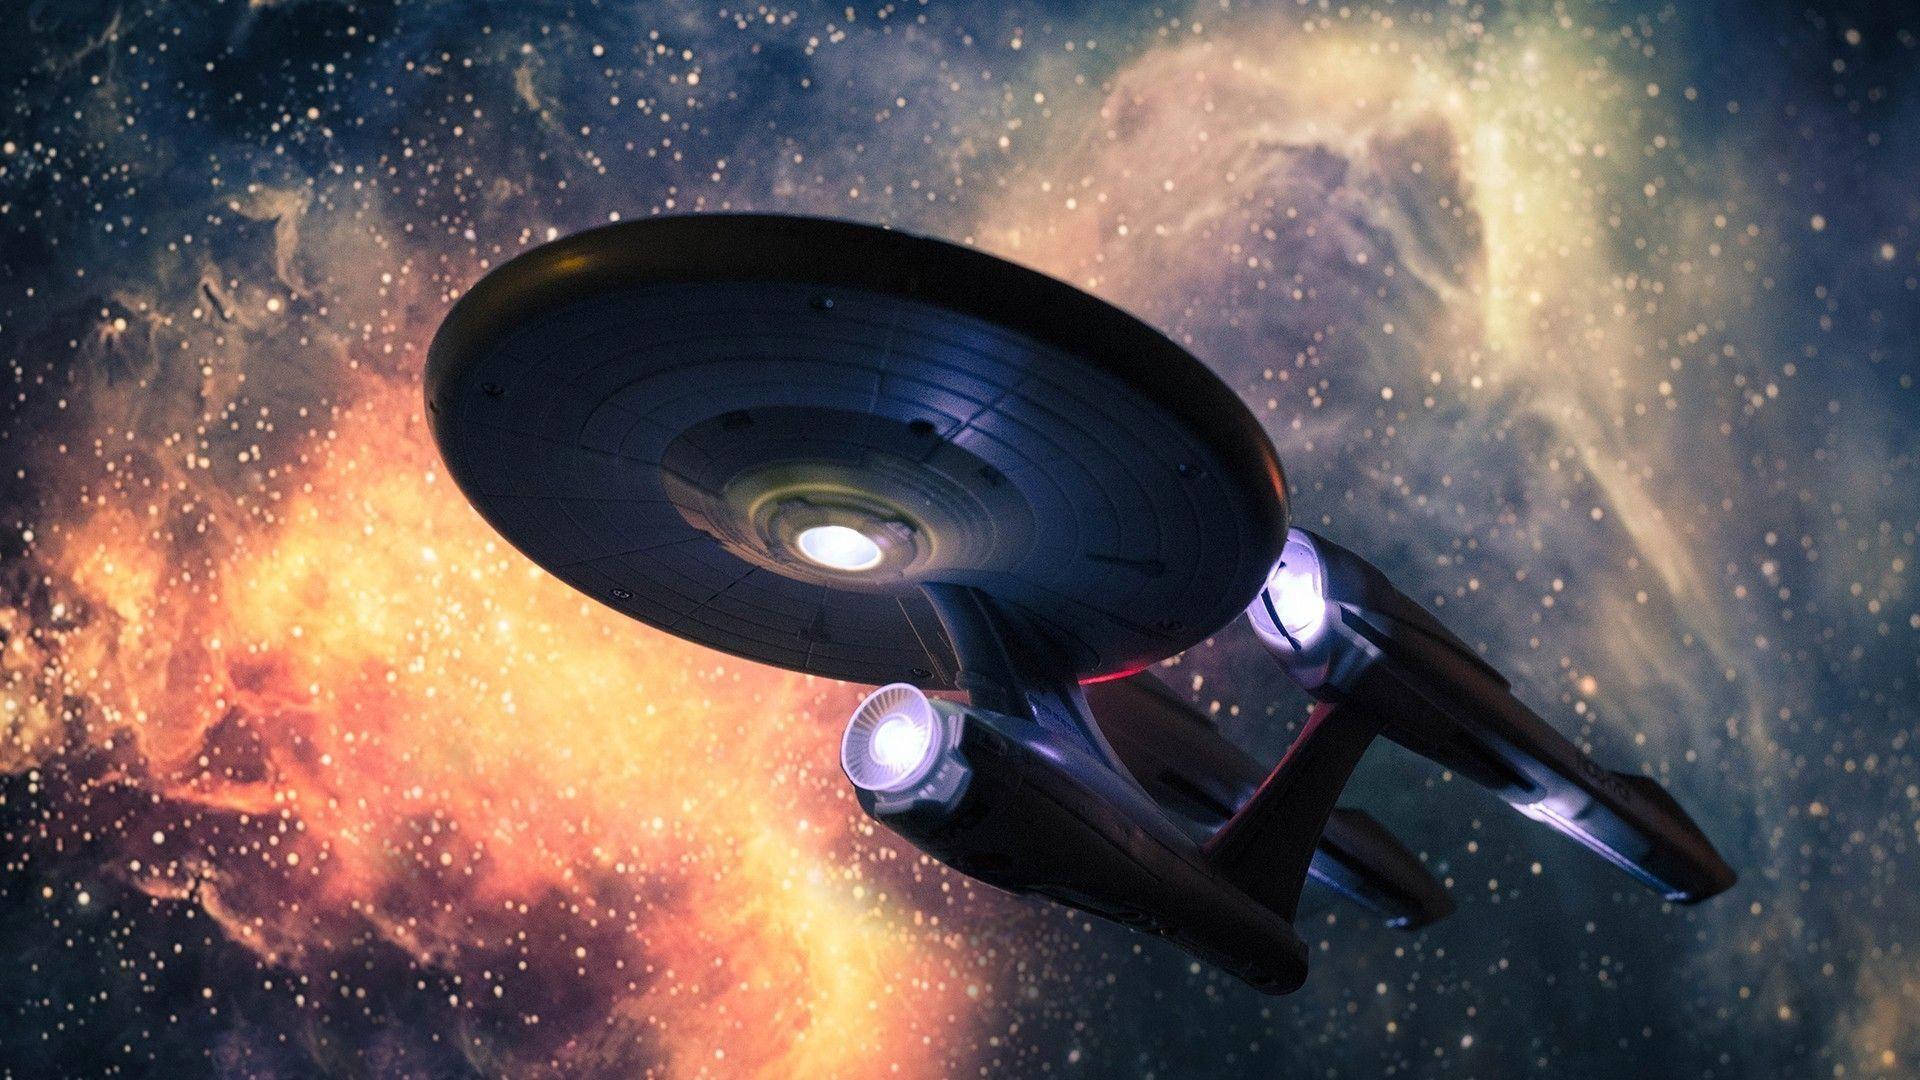 Free Download Star Trek Uss Enterprise Wallpaper 1920x1080 For Android Tablet 4k In 2020 Uss Enterprise Star Trek Uss Enterprise Star Trek Books